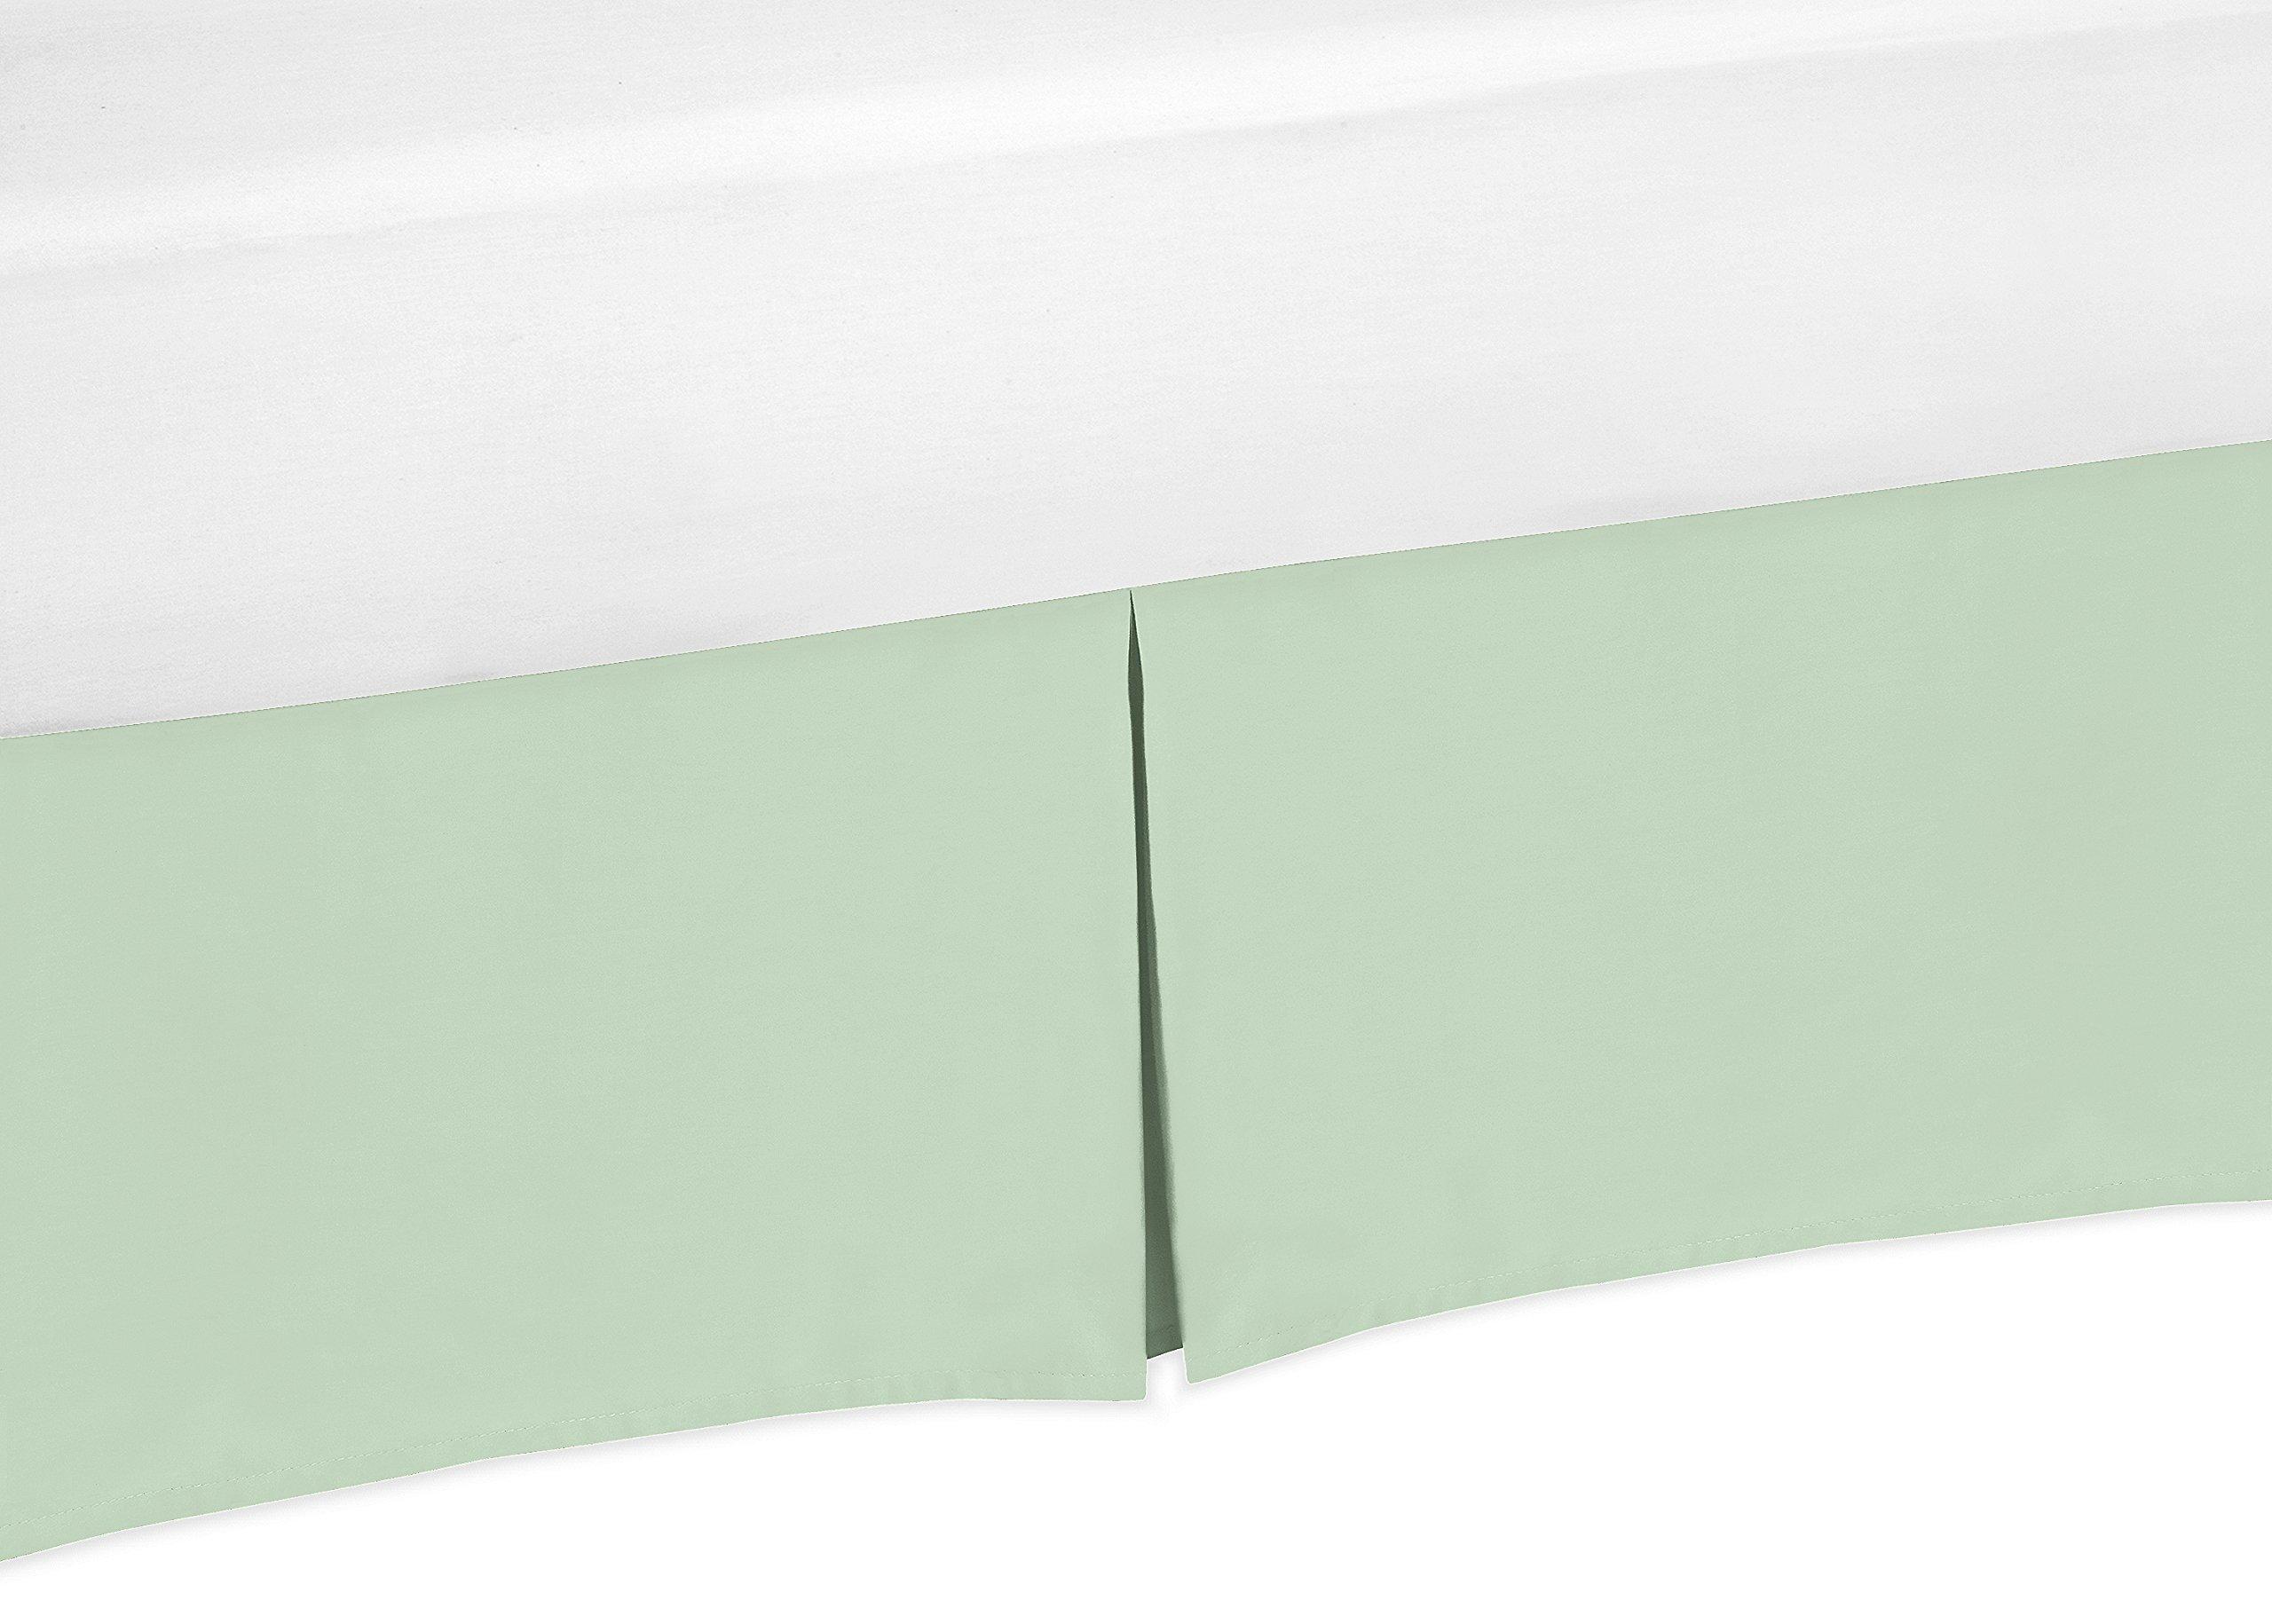 Sweet Jojo Designs Mint Green Crib Bed Skirt forBaby Bedding Sets by Sweet Jojo Designs